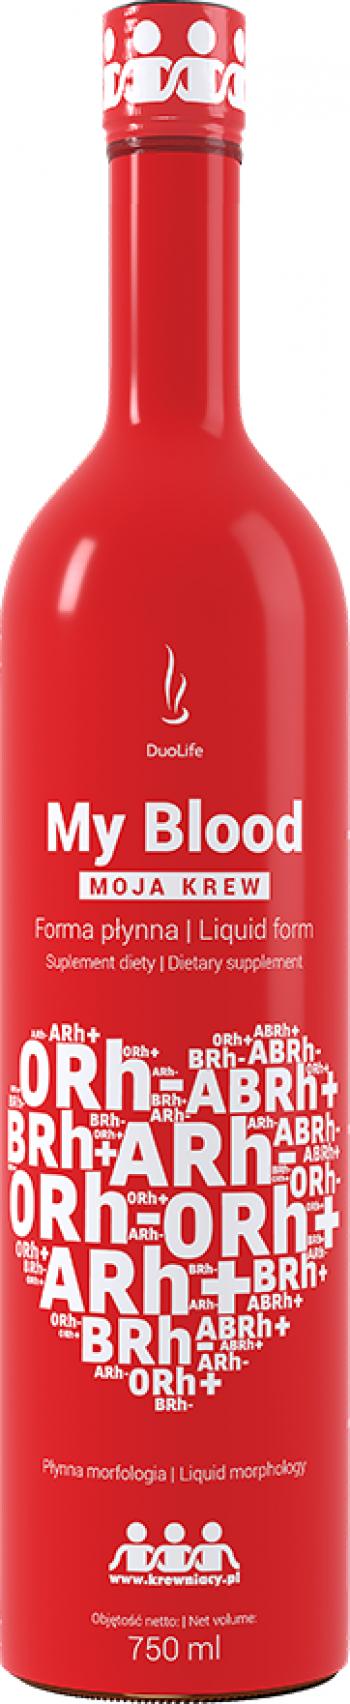 Supliment alimentar DuoLife My Blood 750ml